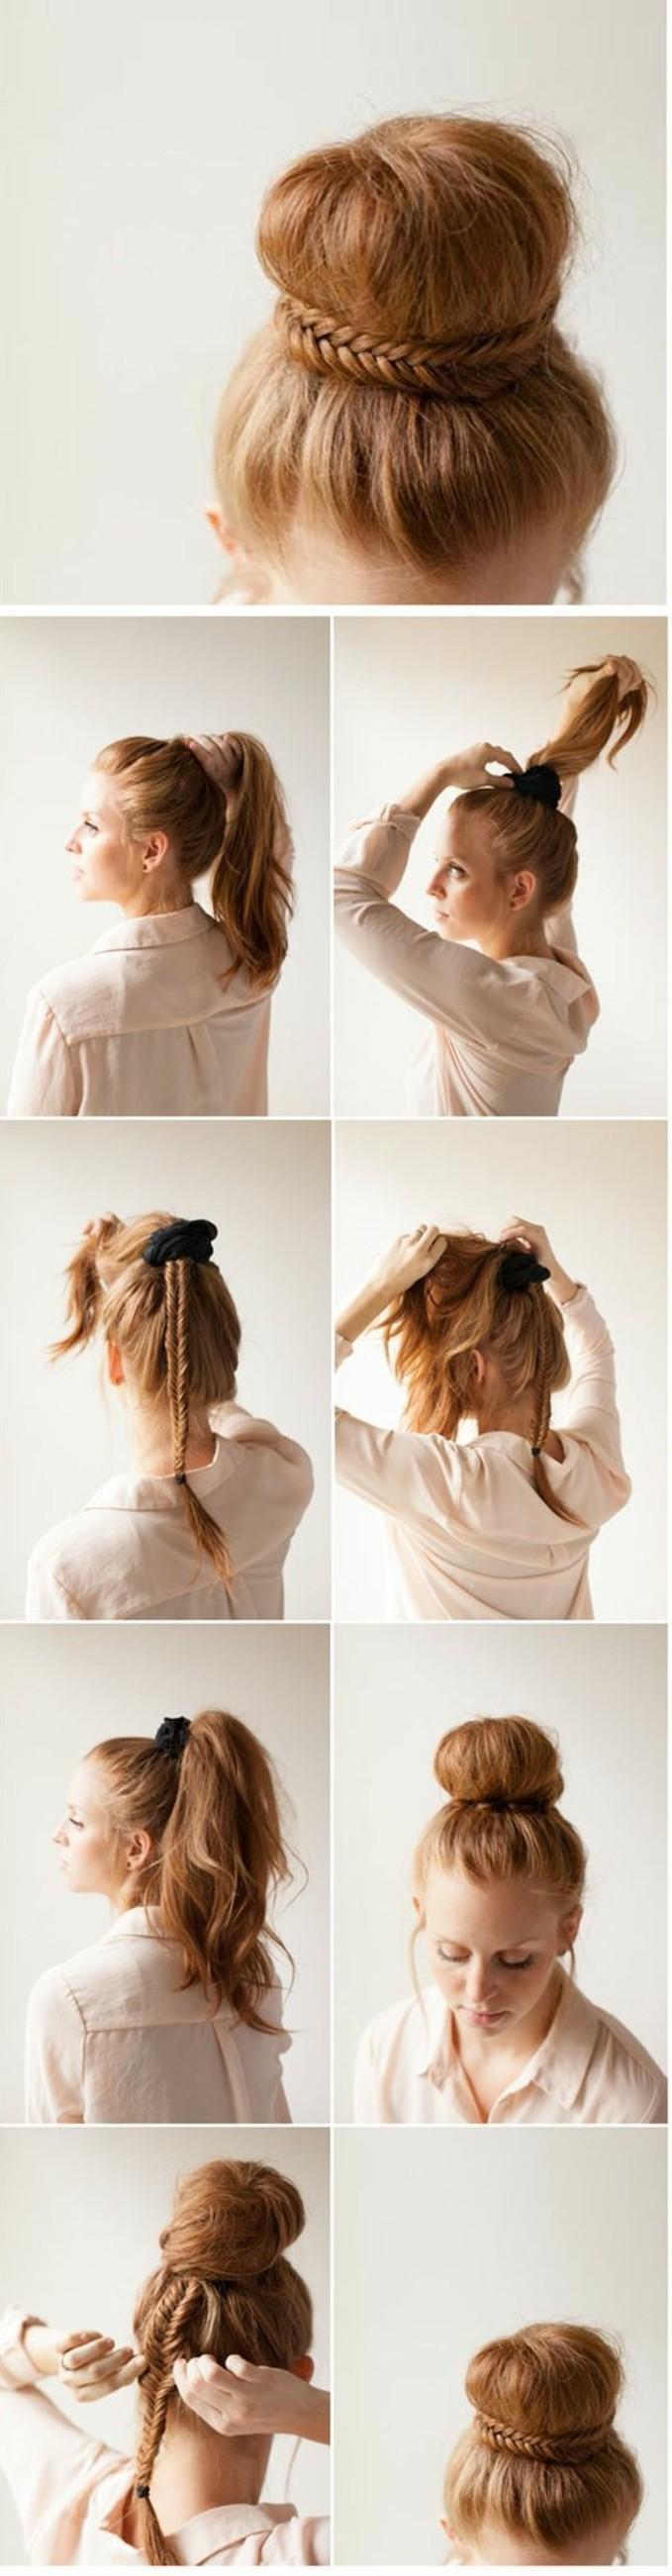 tuto-comment-mettre-un-donut-coiffure-chic-et-elegante